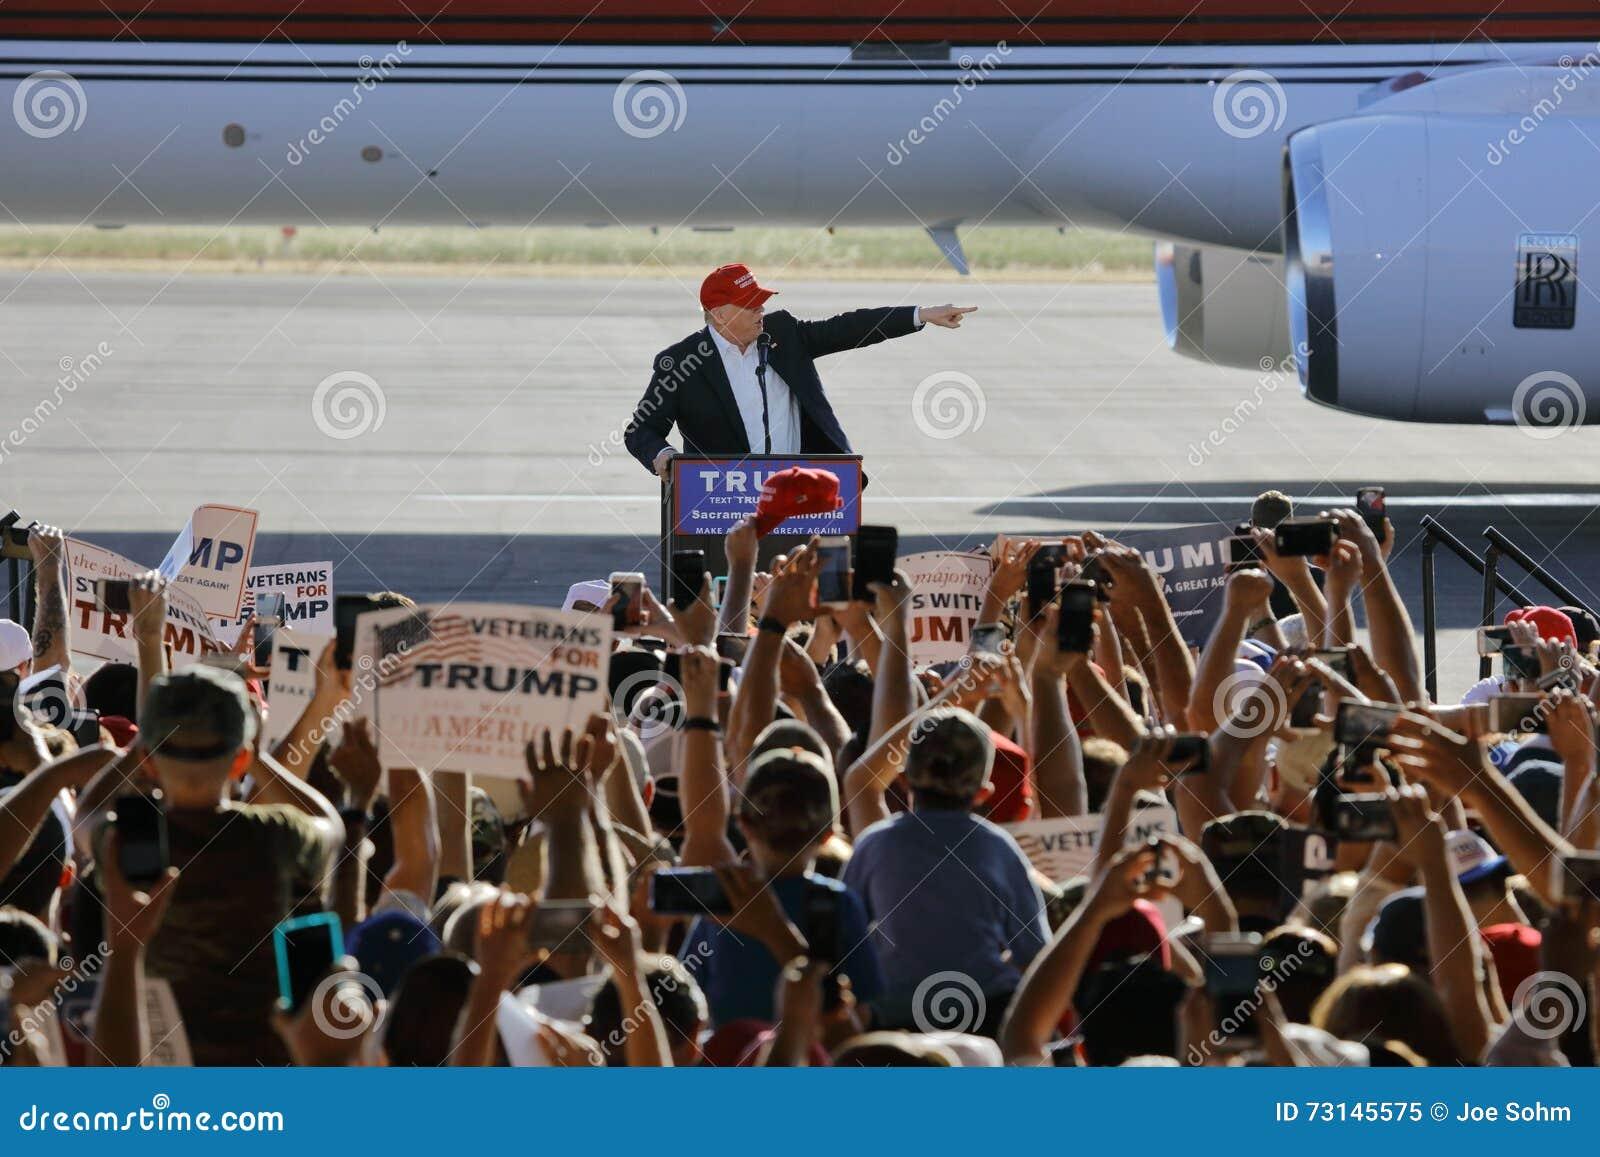 GOP Presidential Candidate Donald Trump Campaigns In Sacramento, California